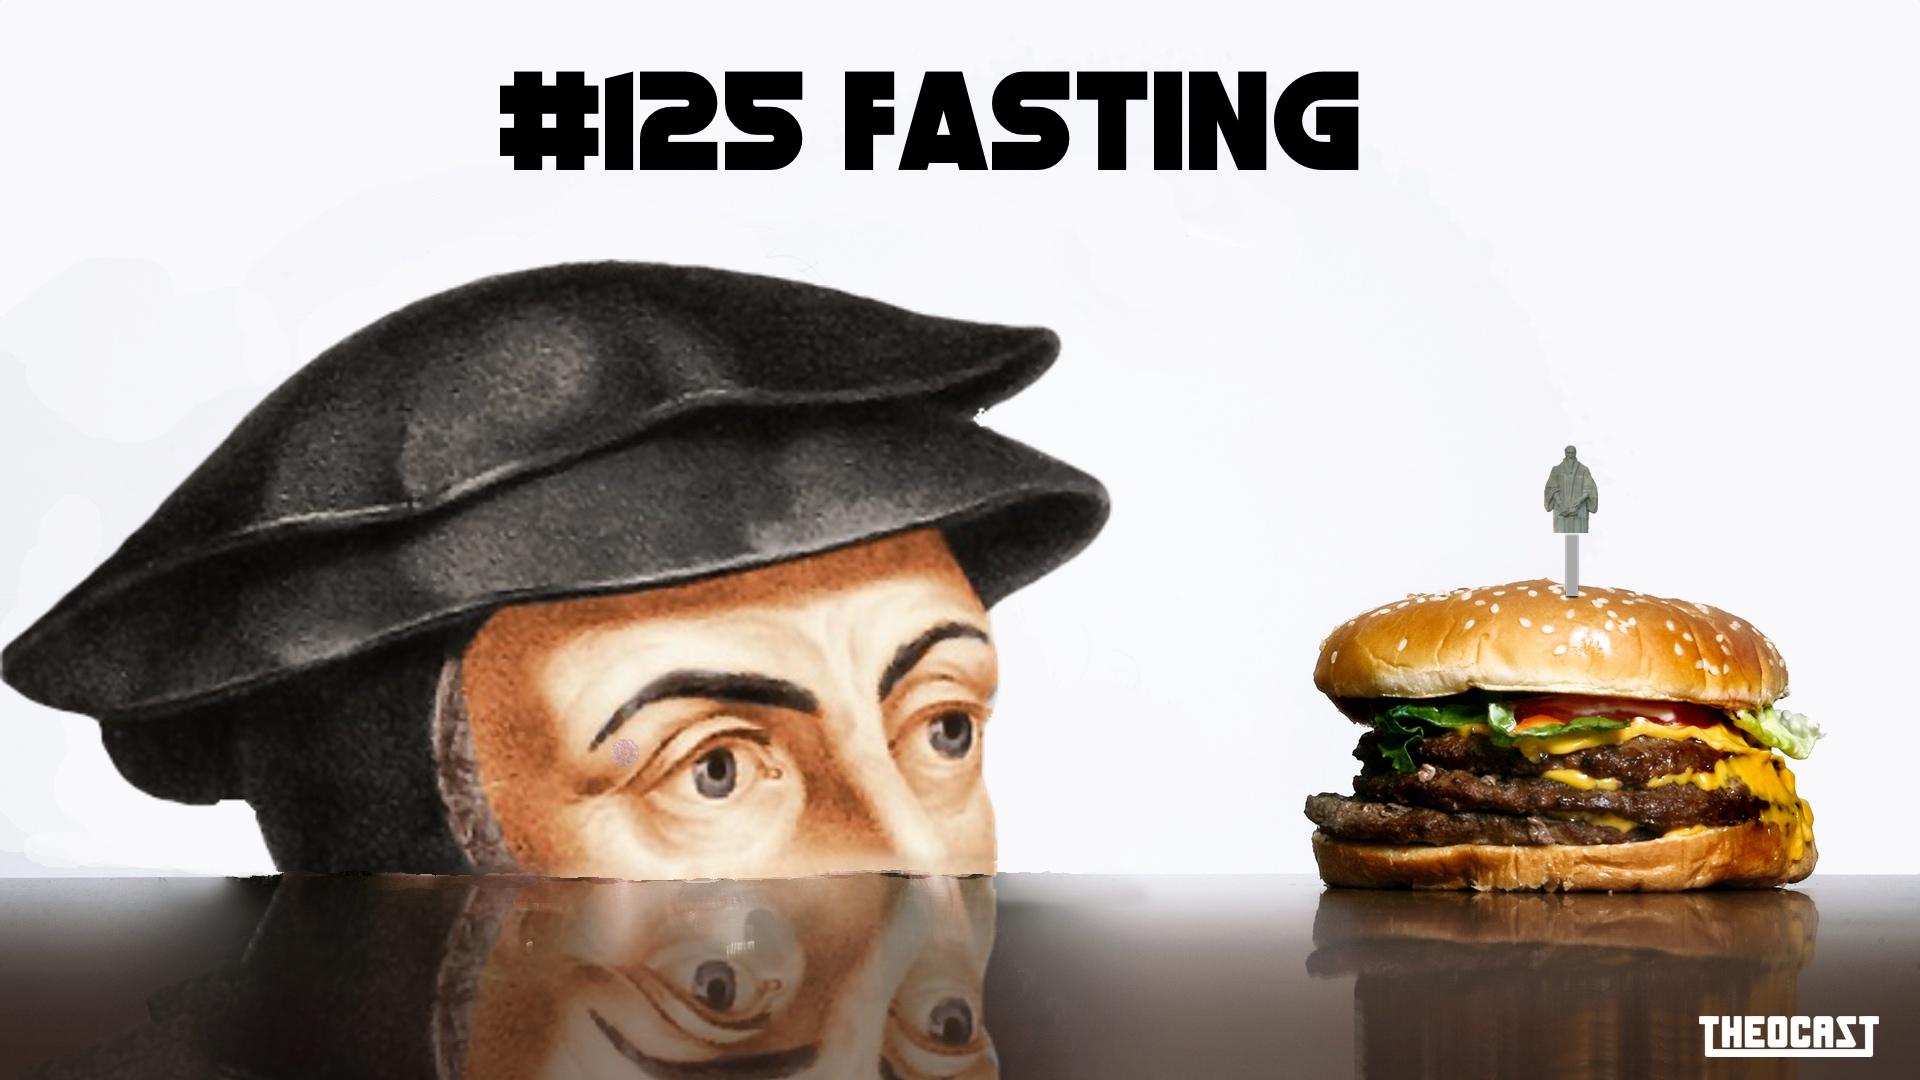 #125 Fasting